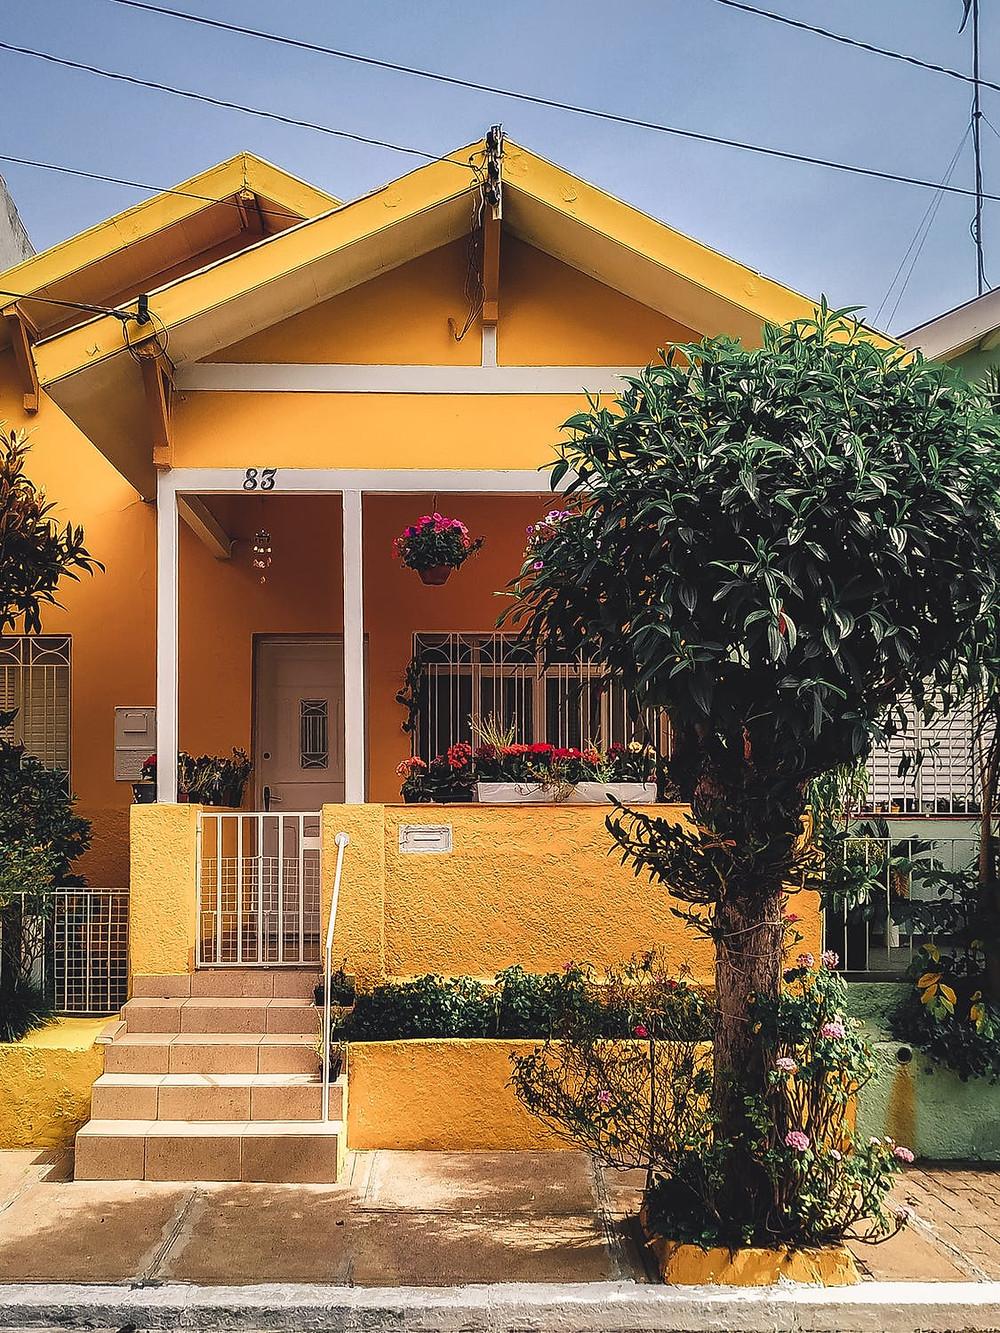 homestay - local culture